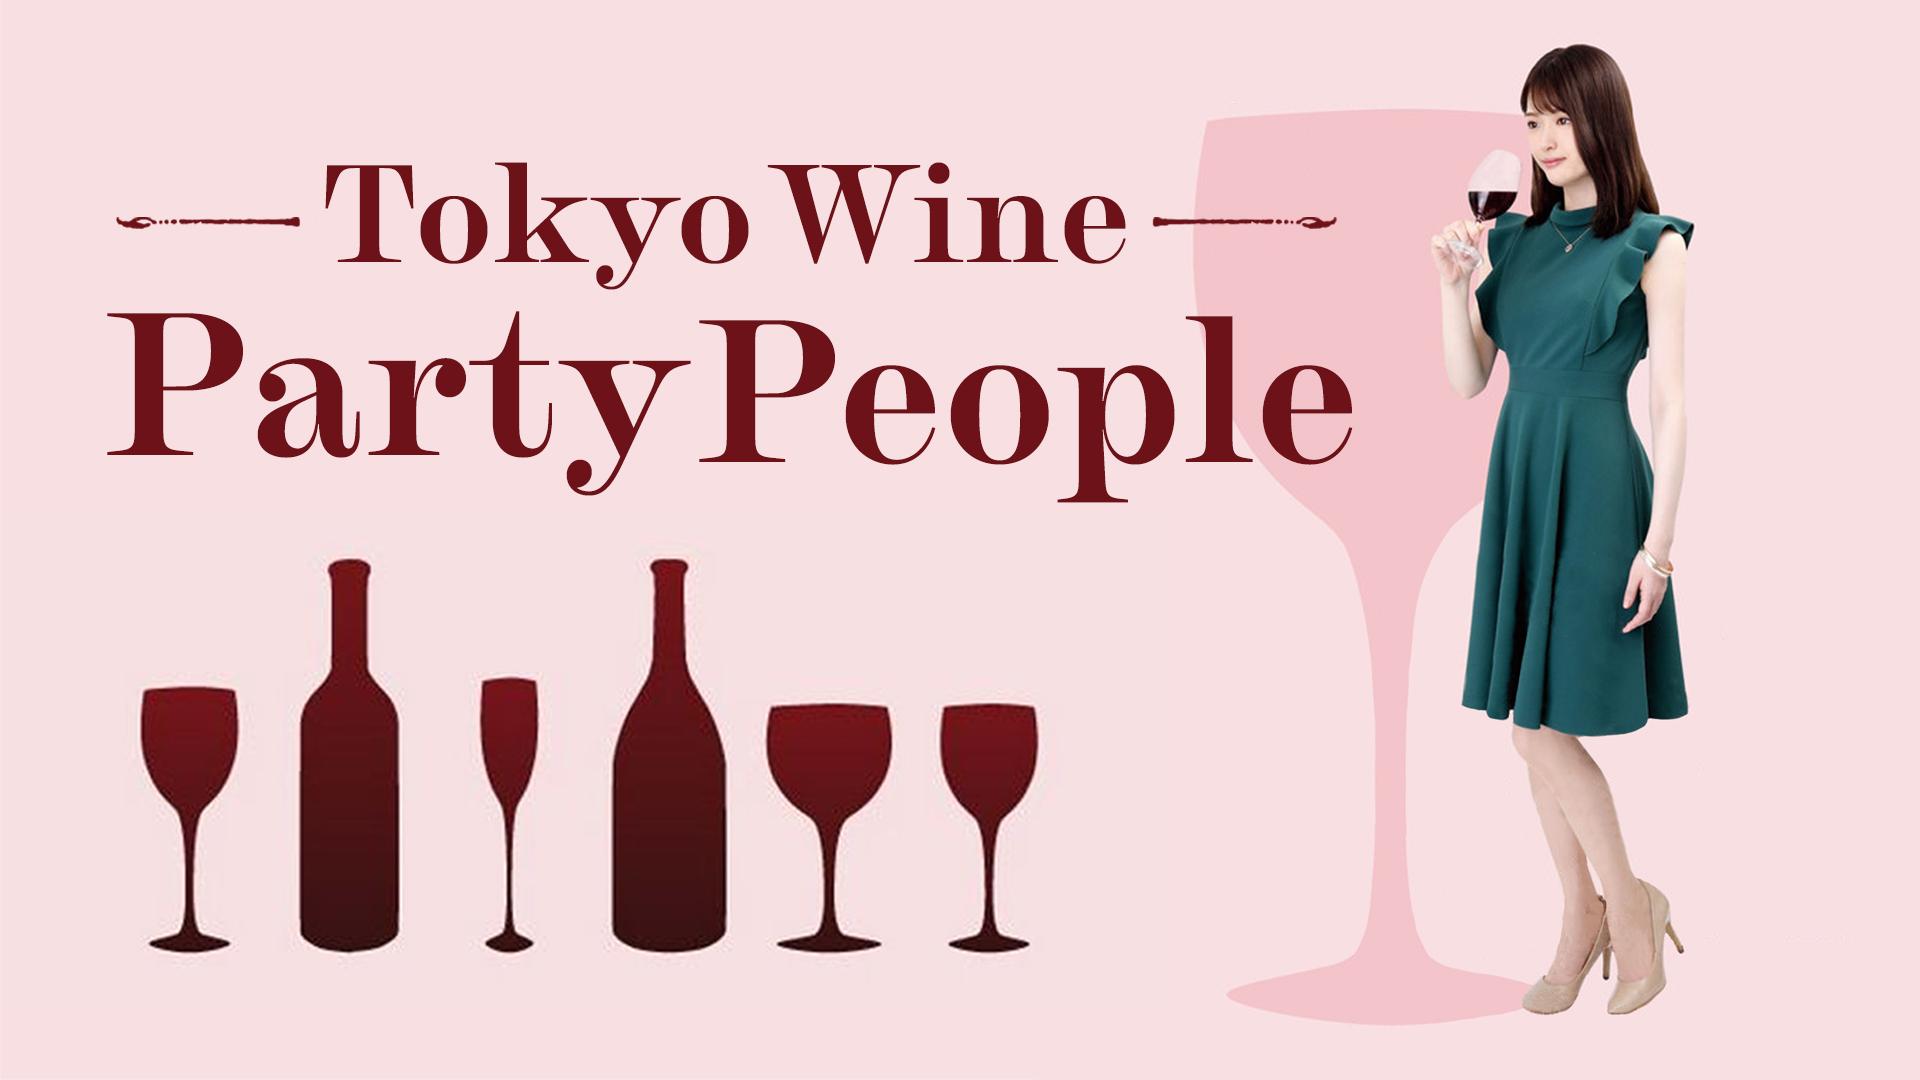 Tokyo Wine Party People